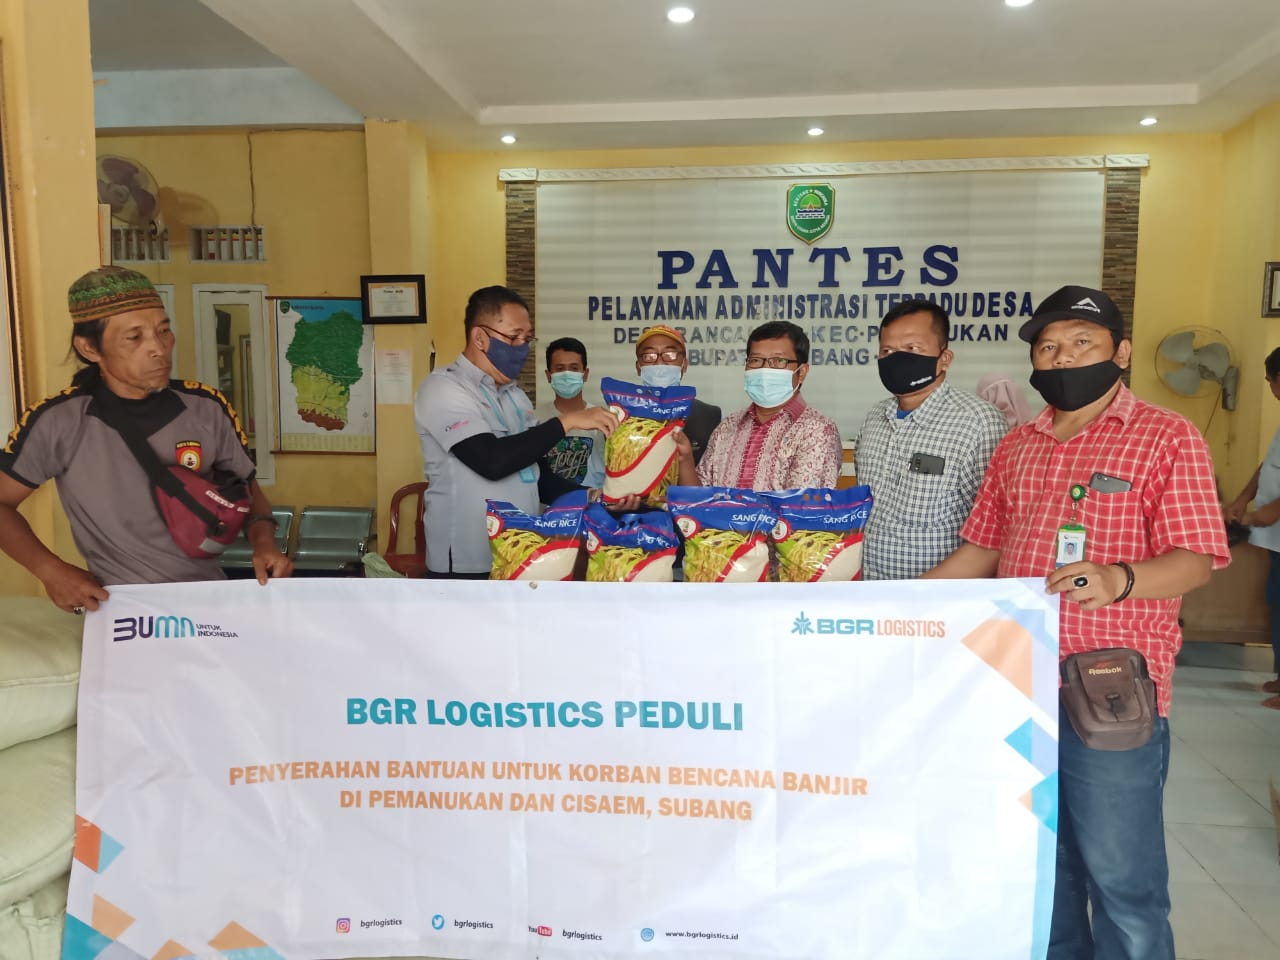 DOK BGR Logistics